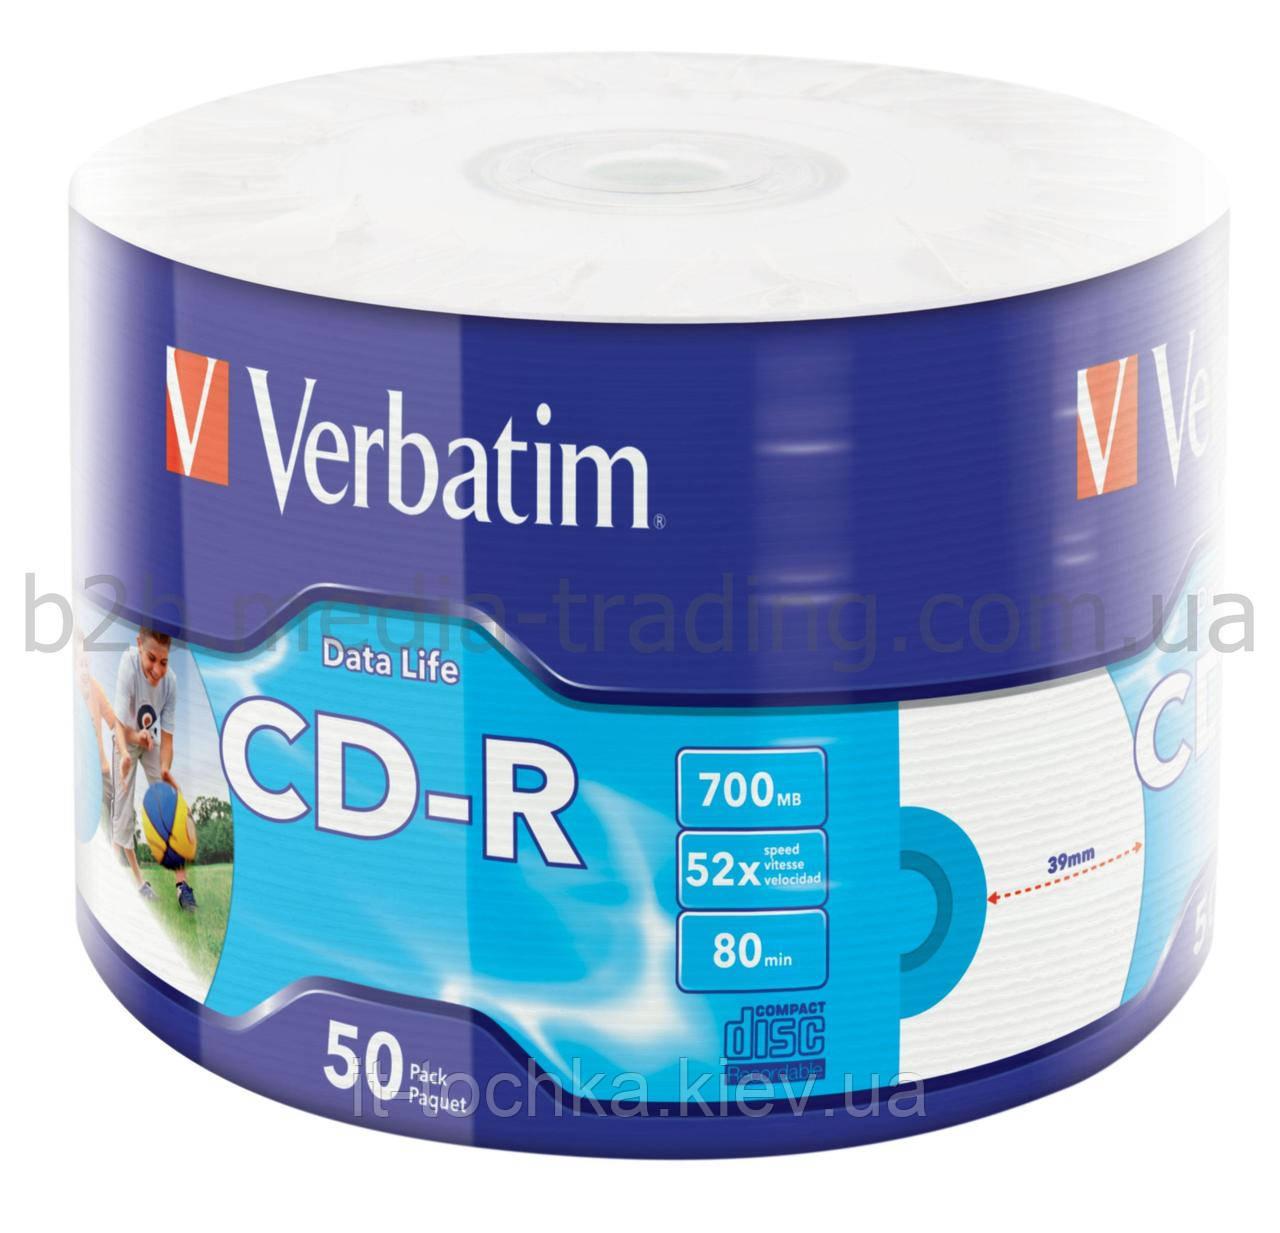 Аудио диски под печать verbatim cd-r 700 Мб 52x bulk 50 штук printable 43794